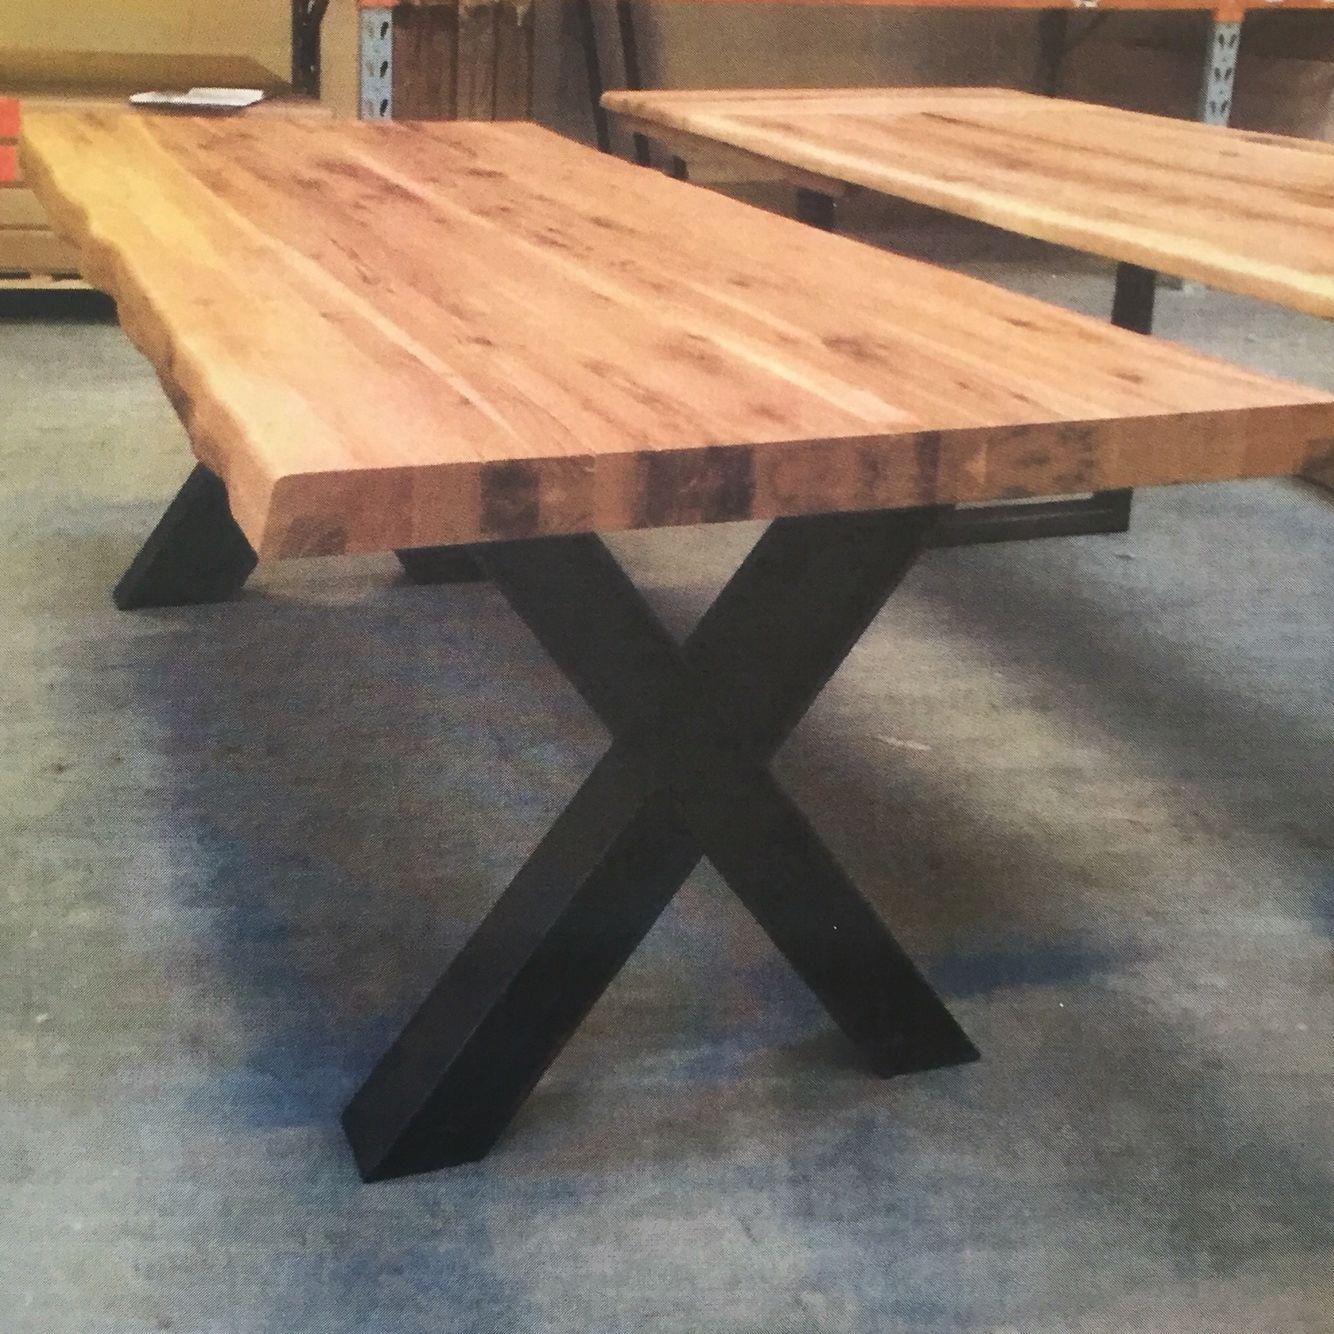 esstische rustikal great esstisch selber bauen rustikal fabulous full size of rustikaler tisch. Black Bedroom Furniture Sets. Home Design Ideas